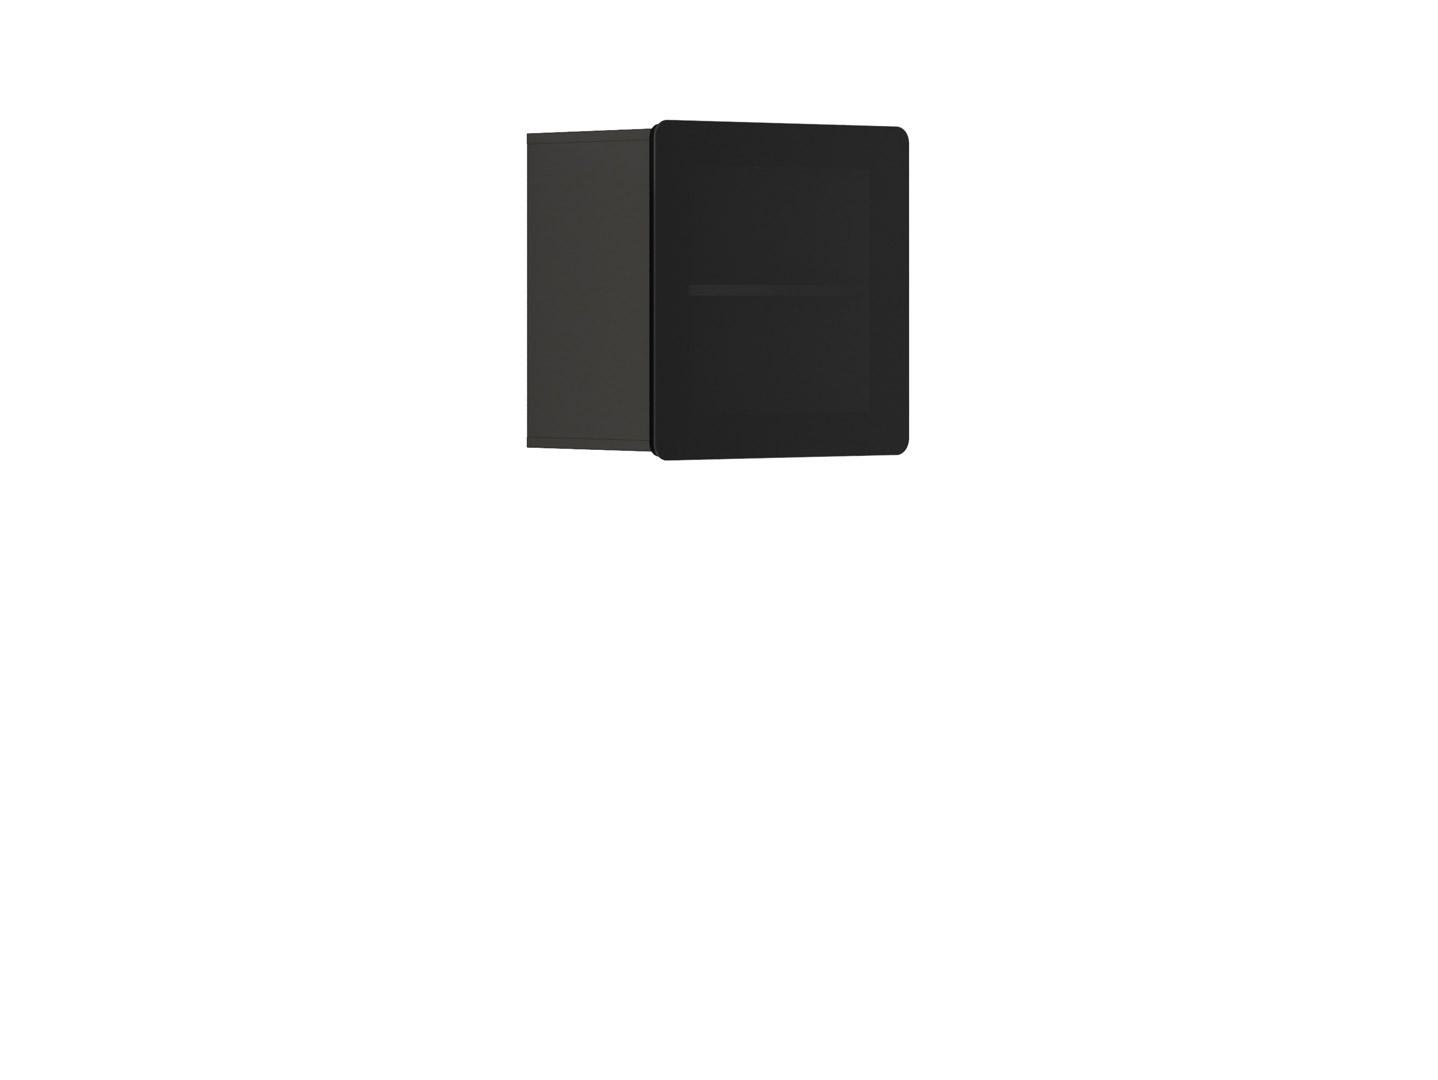 Vitrína na zeď - BRW - Possi Light - SFW1W/5/5 (šedý wolfram) (s osvětlením)